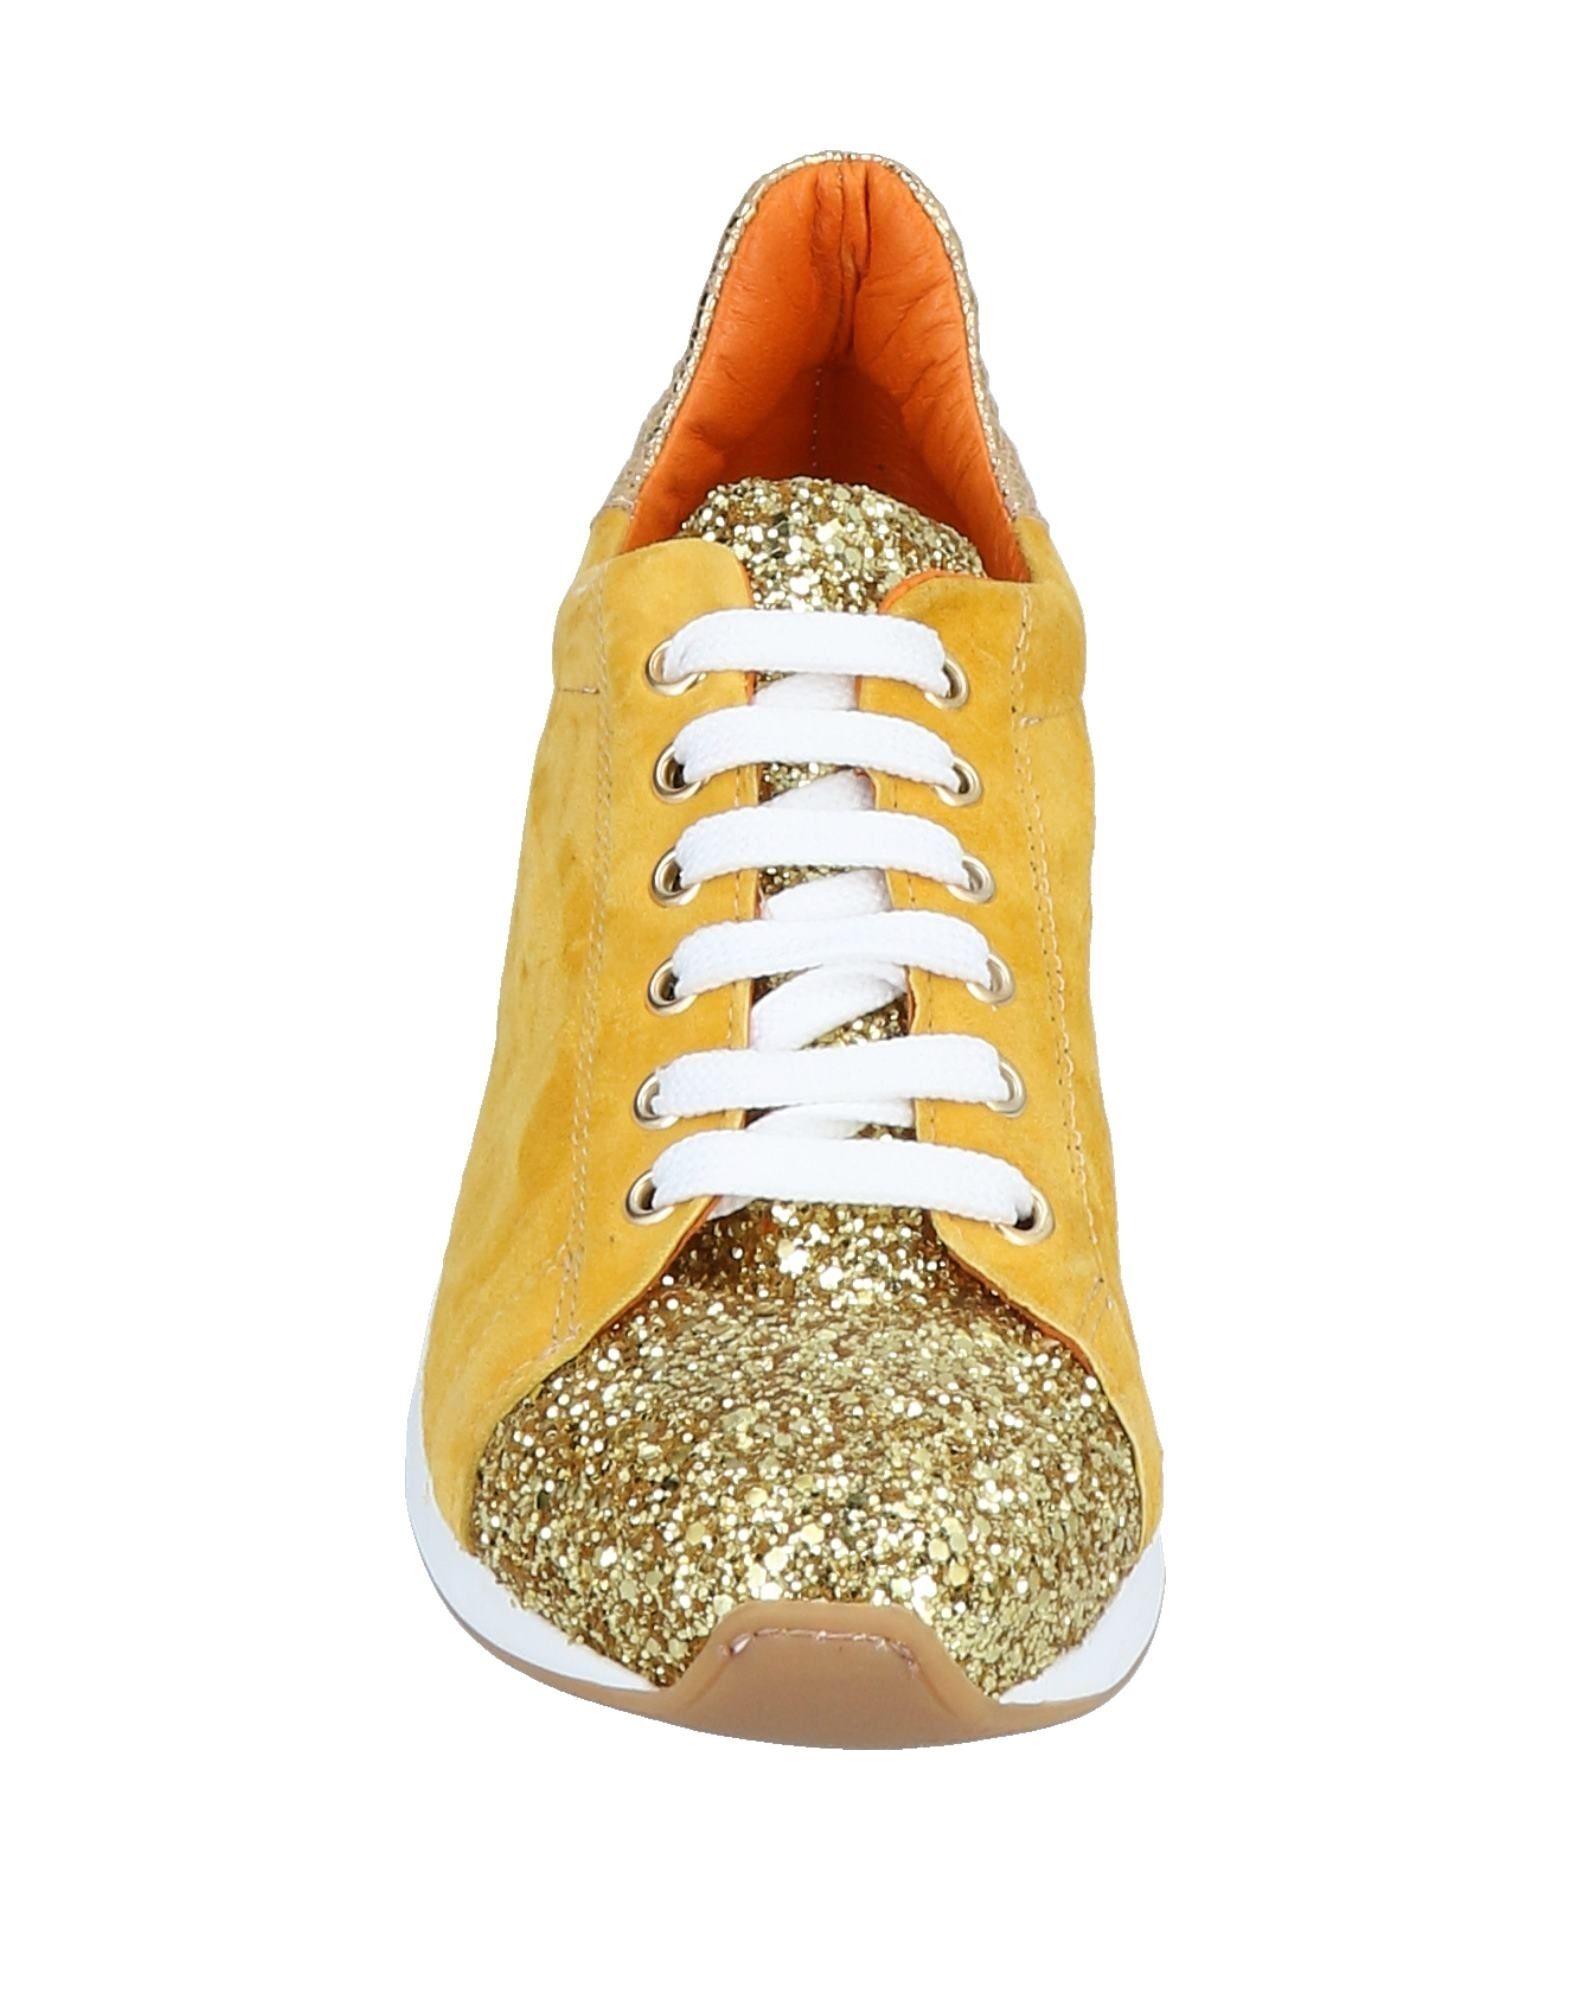 Tsd12 Sneakers - Women Women Women Tsd12 Sneakers online on  United Kingdom - 11567530TQ 88244e